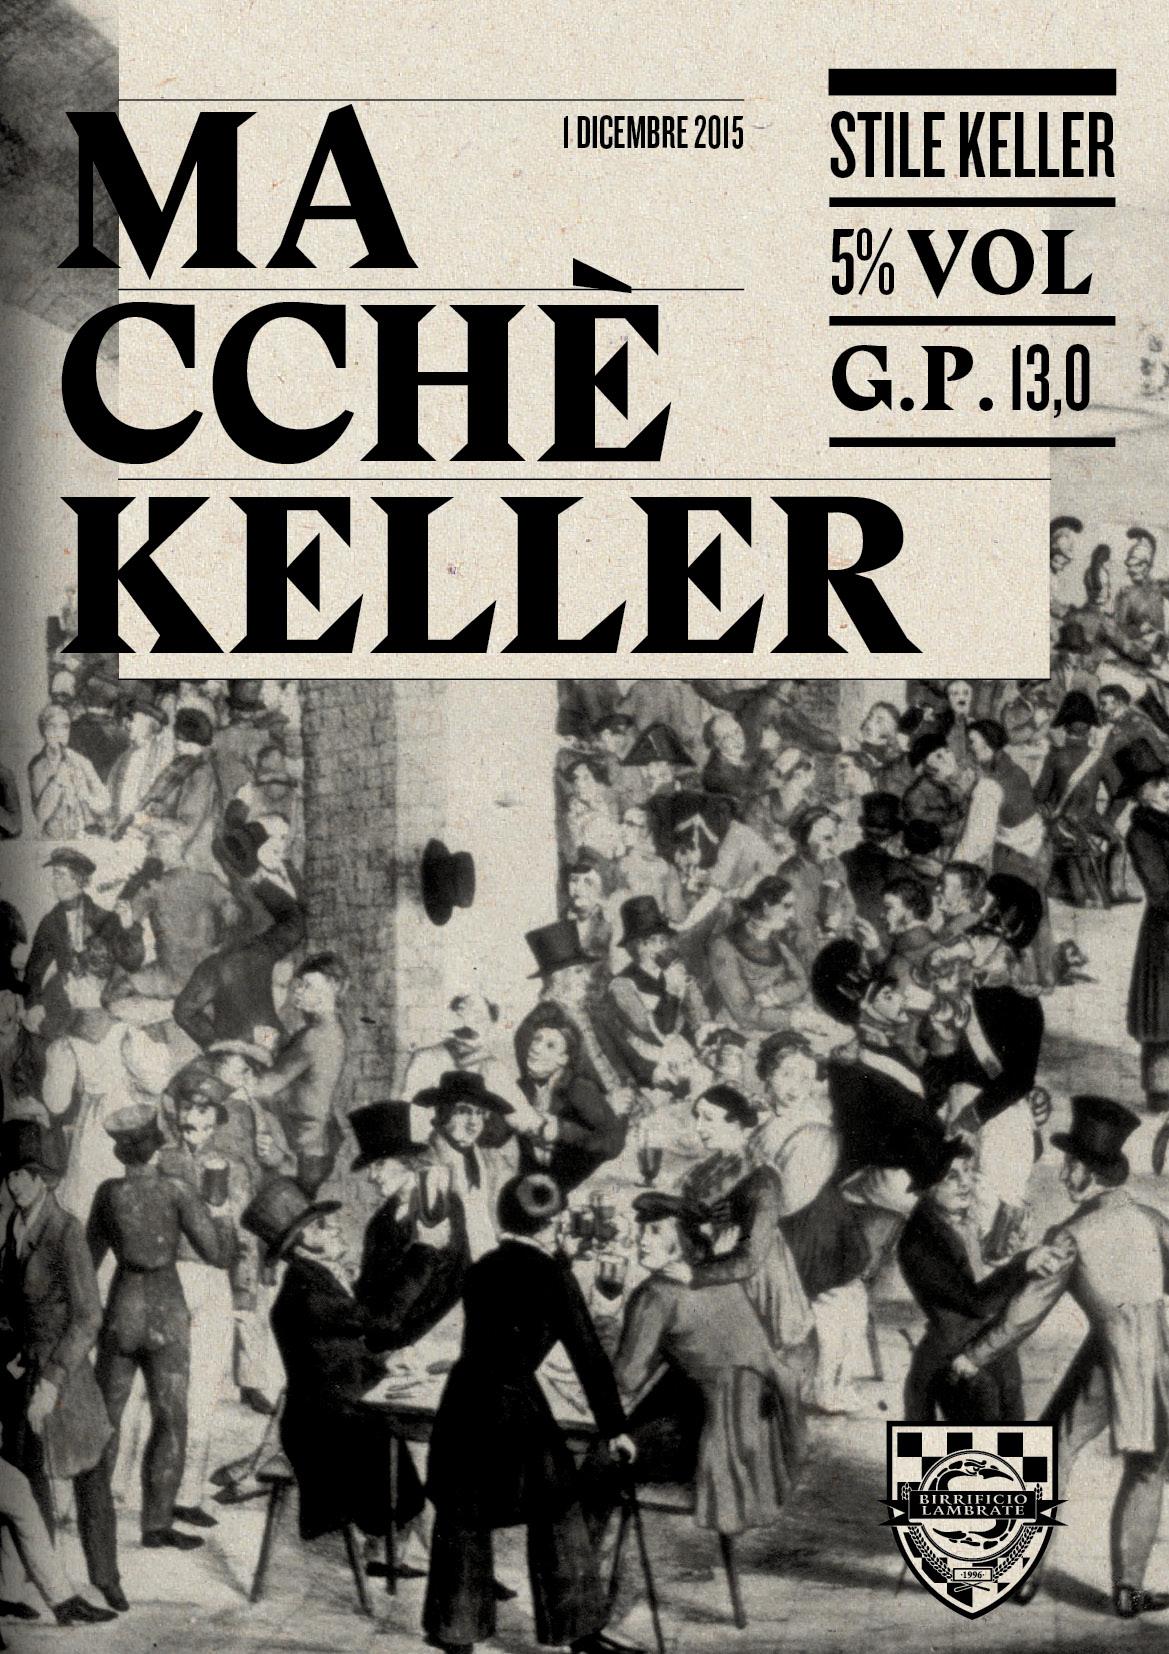 KELLER-Web